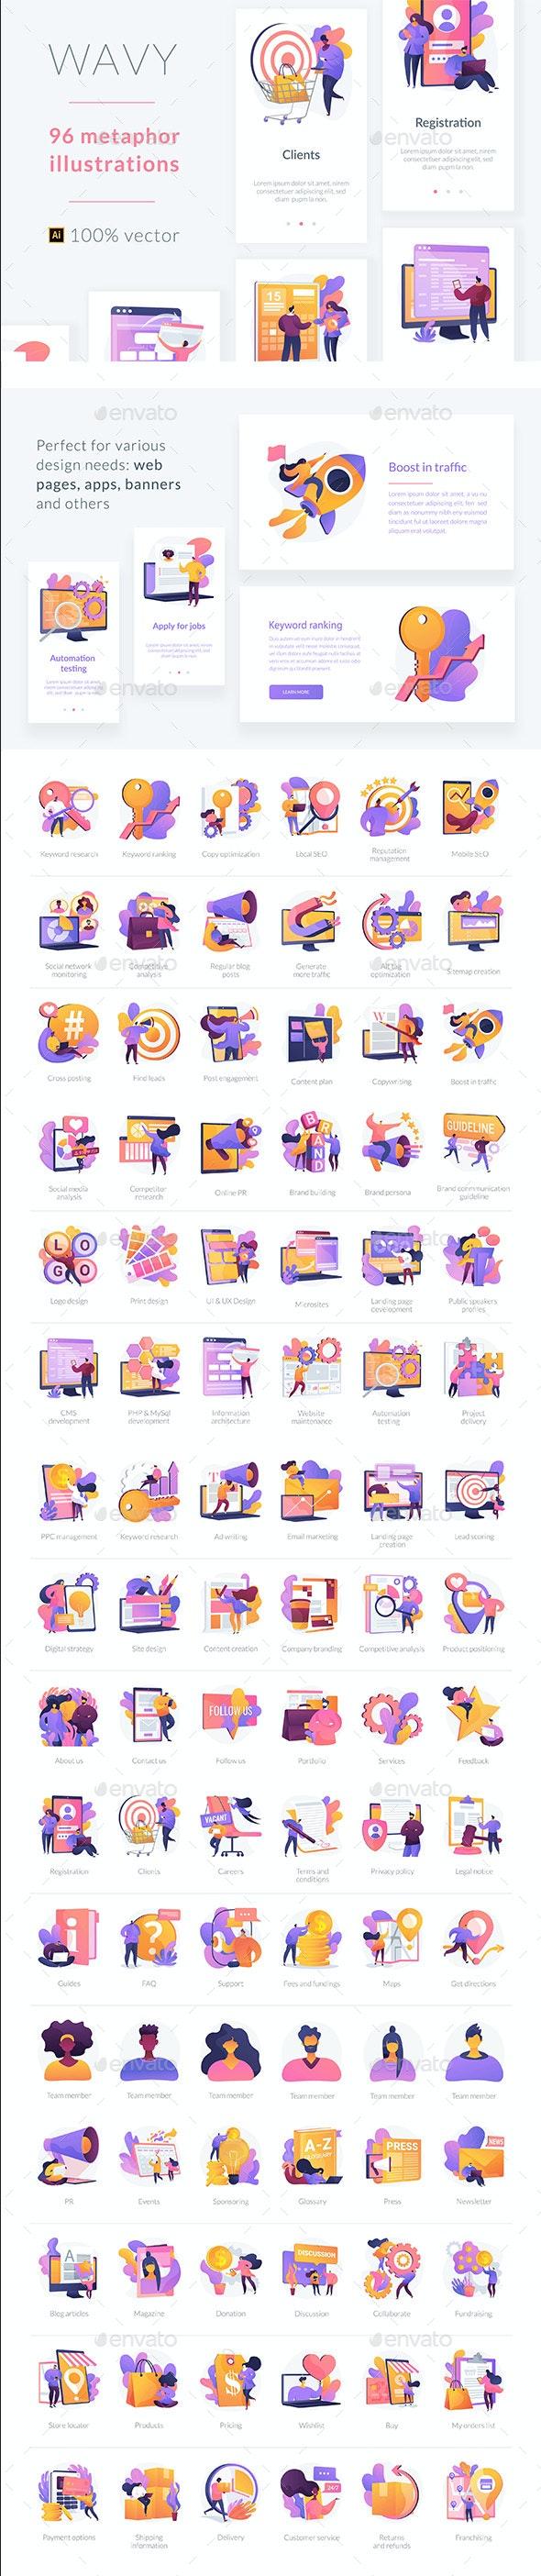 96 Metaphor Illustrations for UI Design - Concepts Business